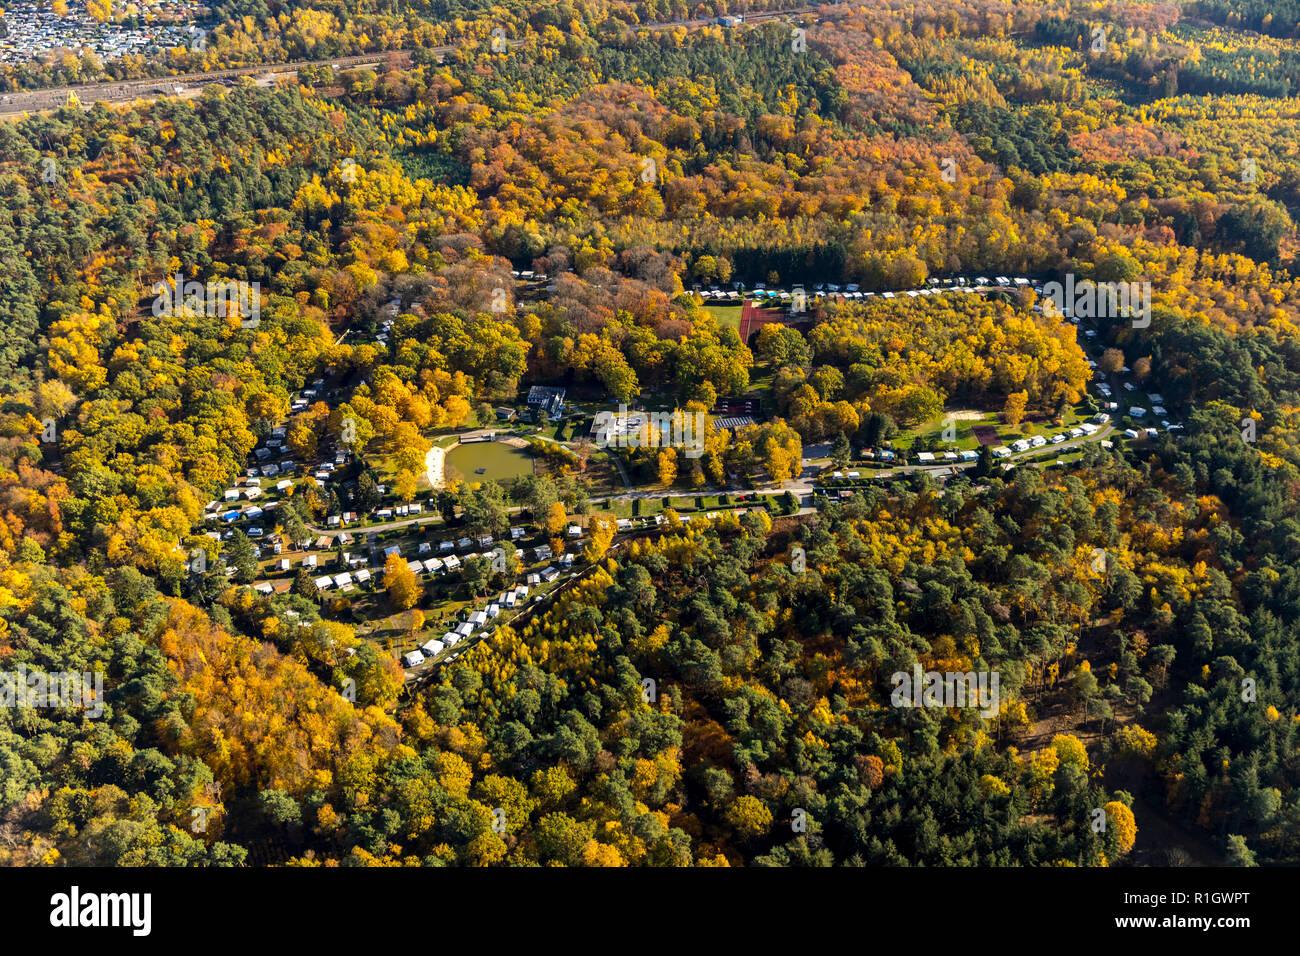 Aerial View, LBN Duisburg, camping, Big Tree, Duisburg, Ruhr, Nordrhein-Westfalen, Germany, DEU, Europe, aerial view, birds-eyes view, aerial photogra - Stock Image